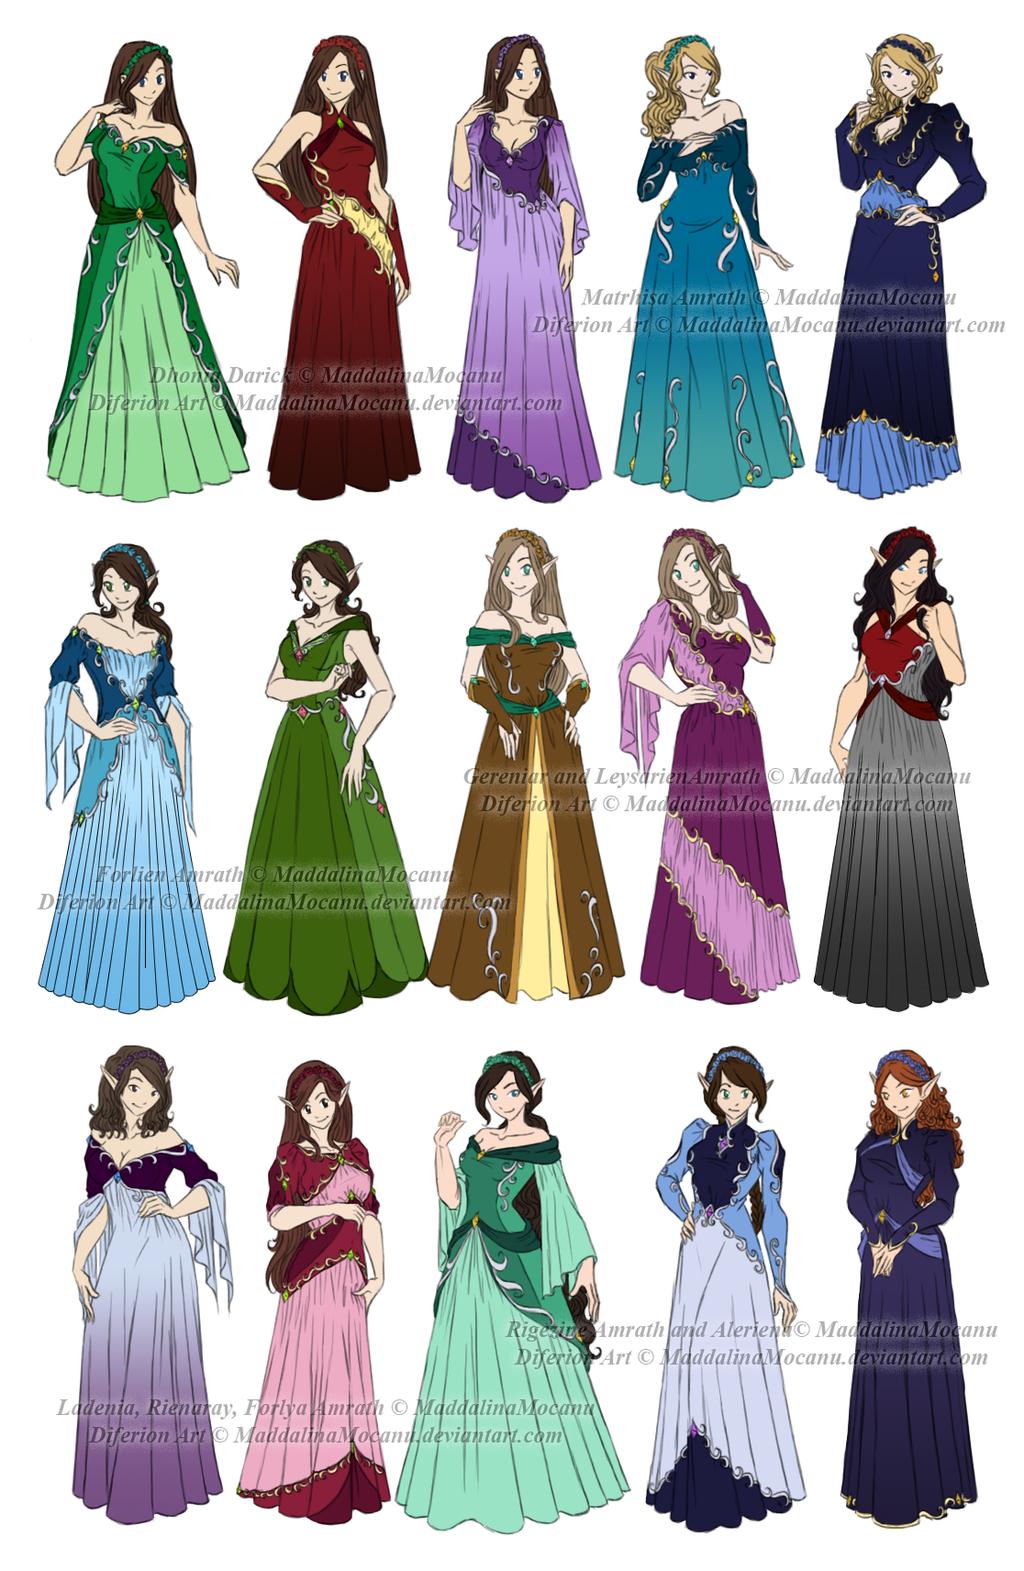 The dress designs - Dress N Clothes Designs P5 1 2 Diferion Wedding By Maddalinamocanu On Deviantart